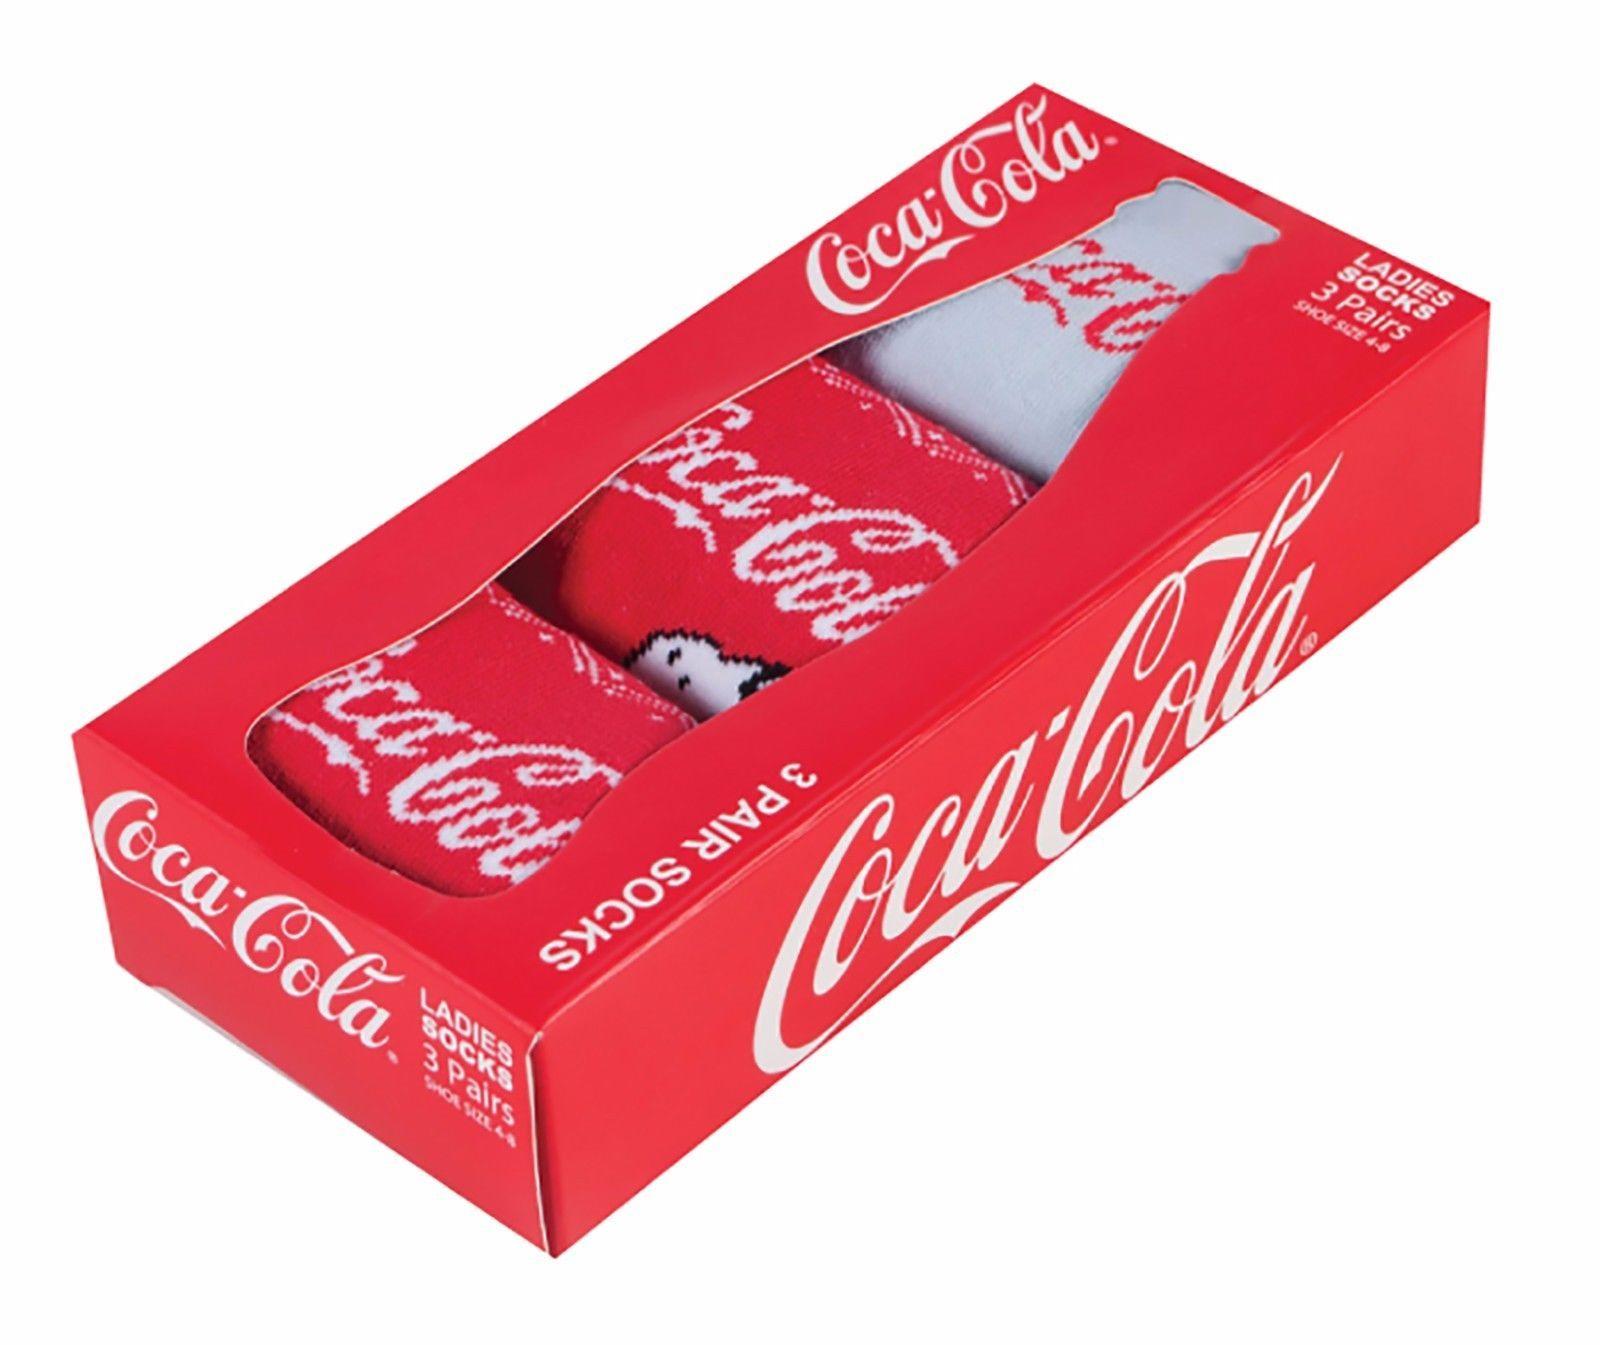 Coca Cola - 3 Pack Women Mens Patterned Novelty Cotton Xmas Christmas Crew Socks